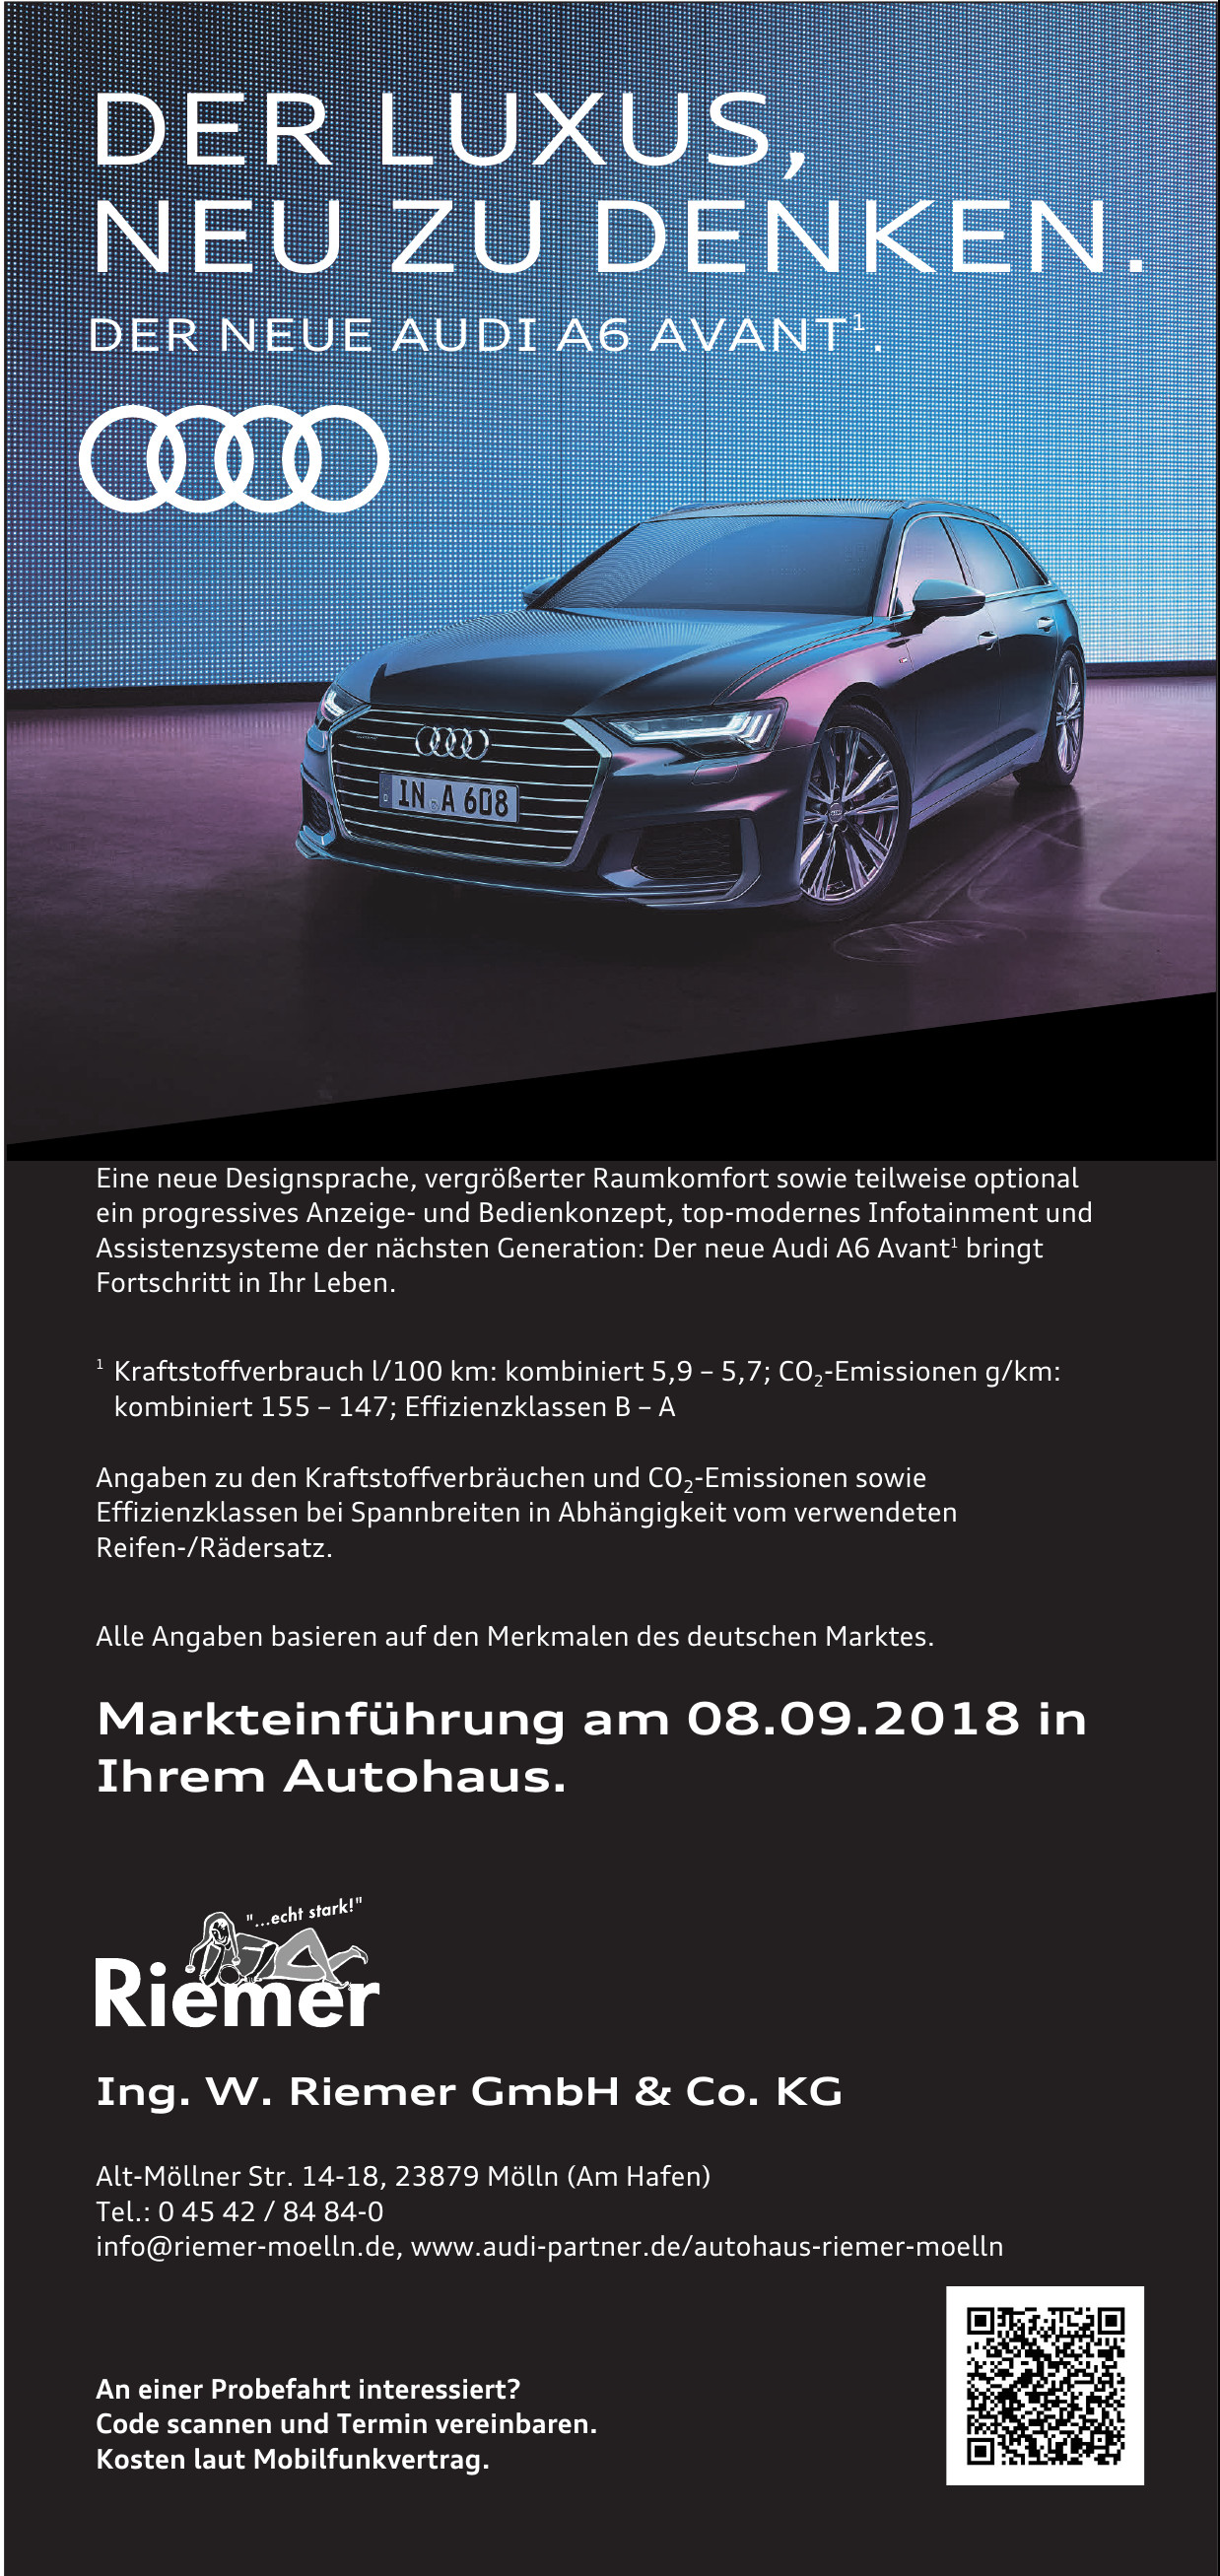 Ing. W. Riemer GmbH & Co. KG